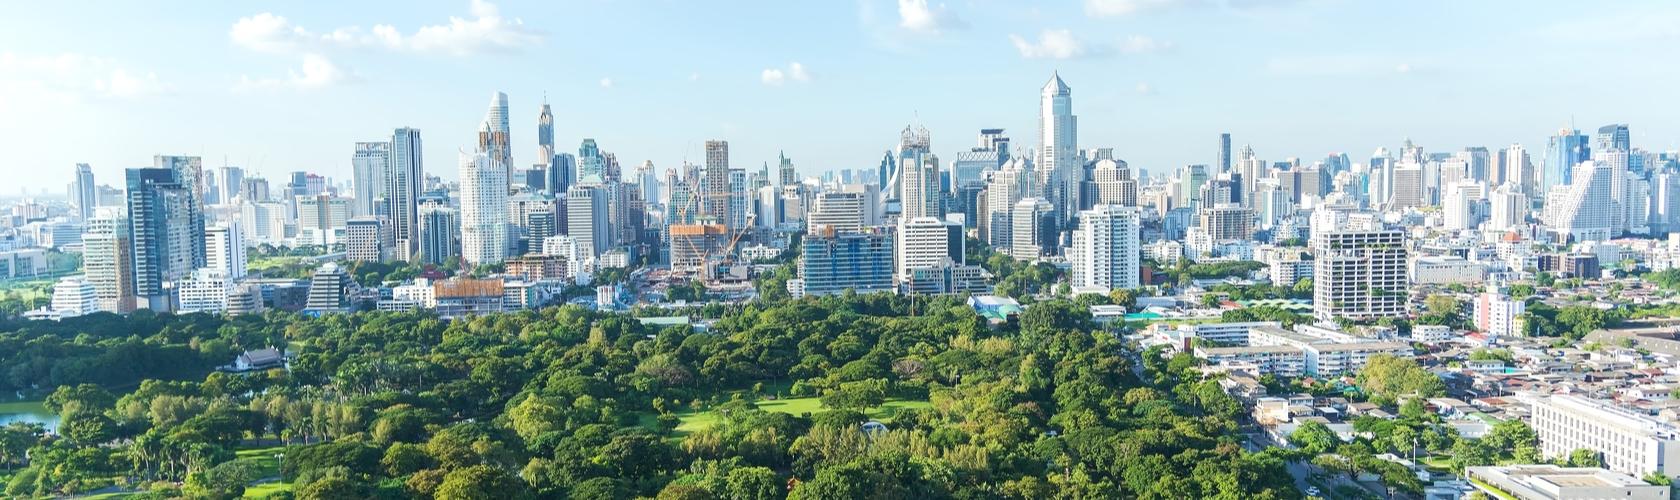 Airline Industry Retailing Symposium bangkok